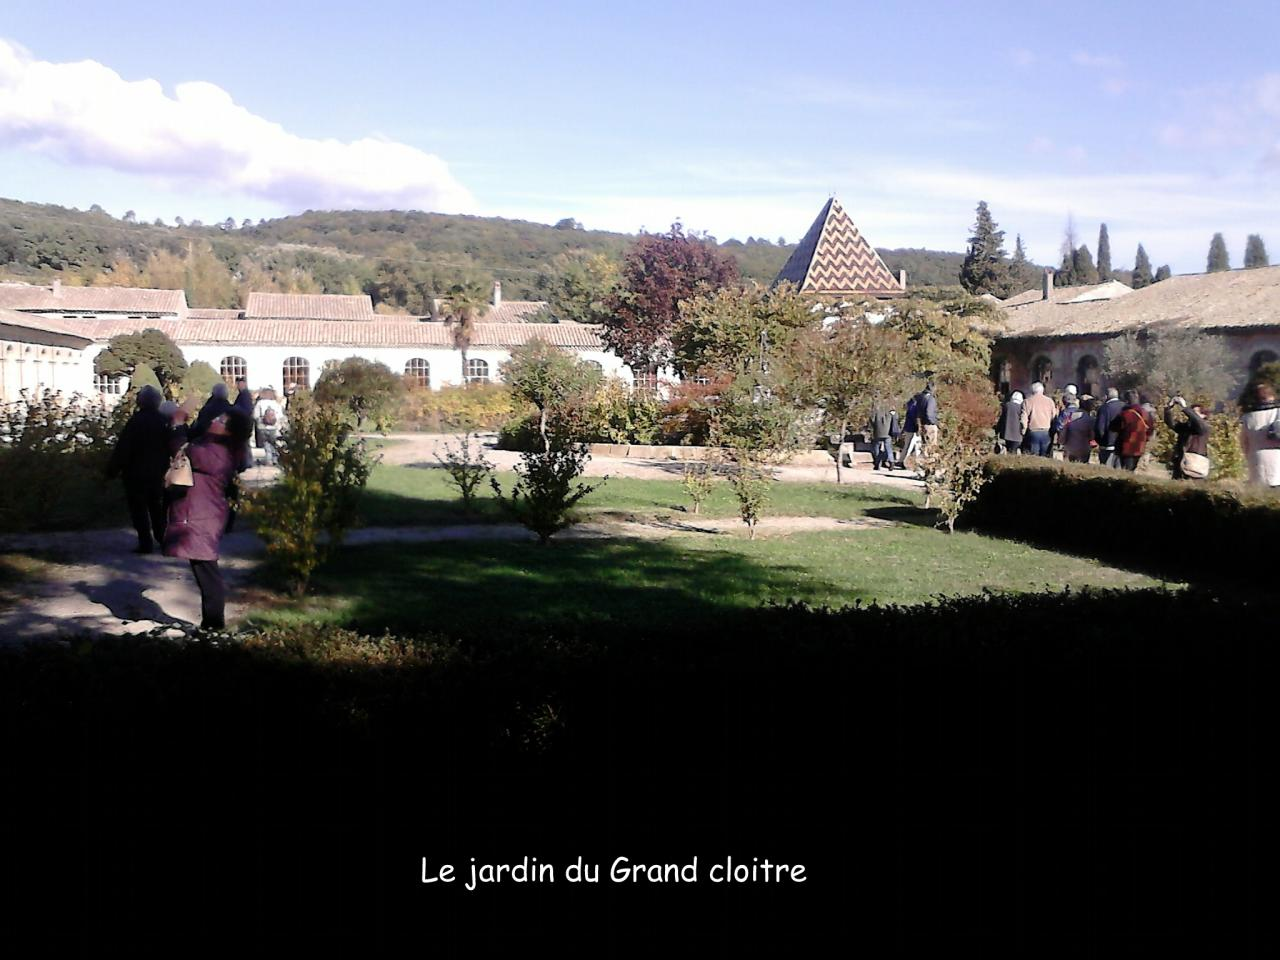 Le jardin du grand cloître